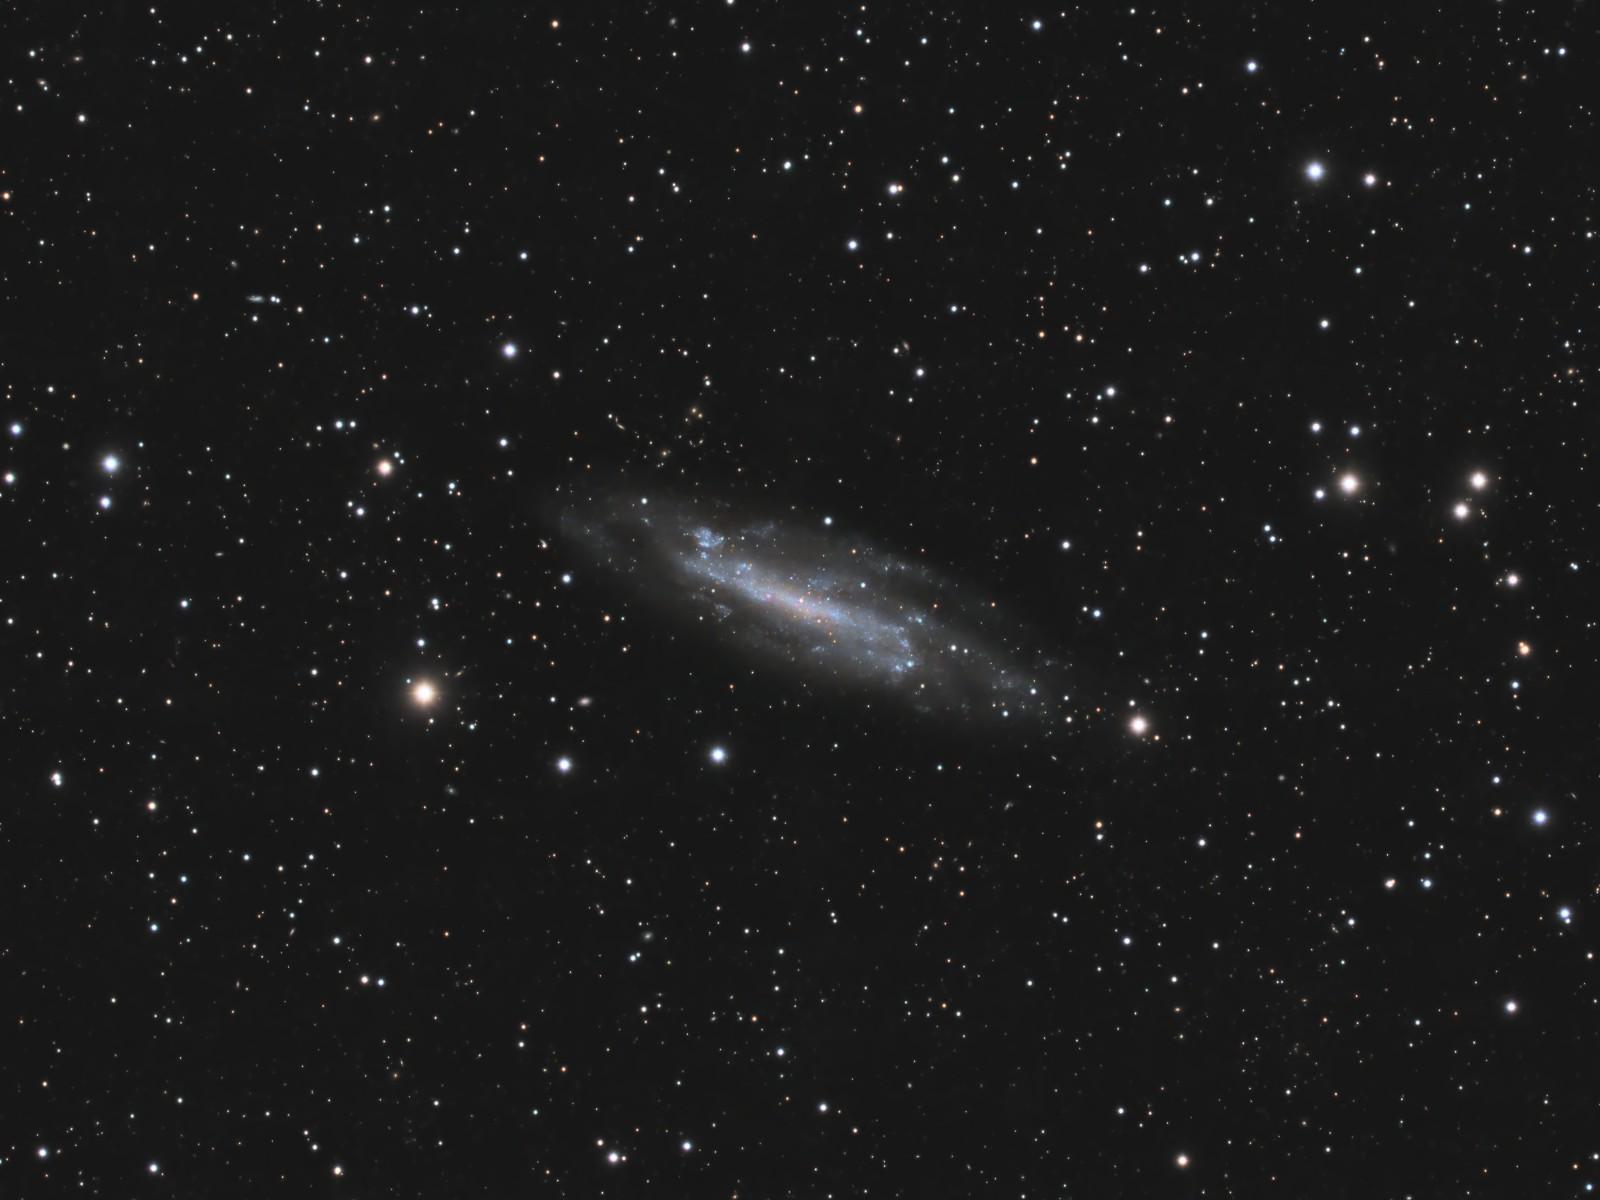 NGC 4236 – Barred Spiral Galaxy